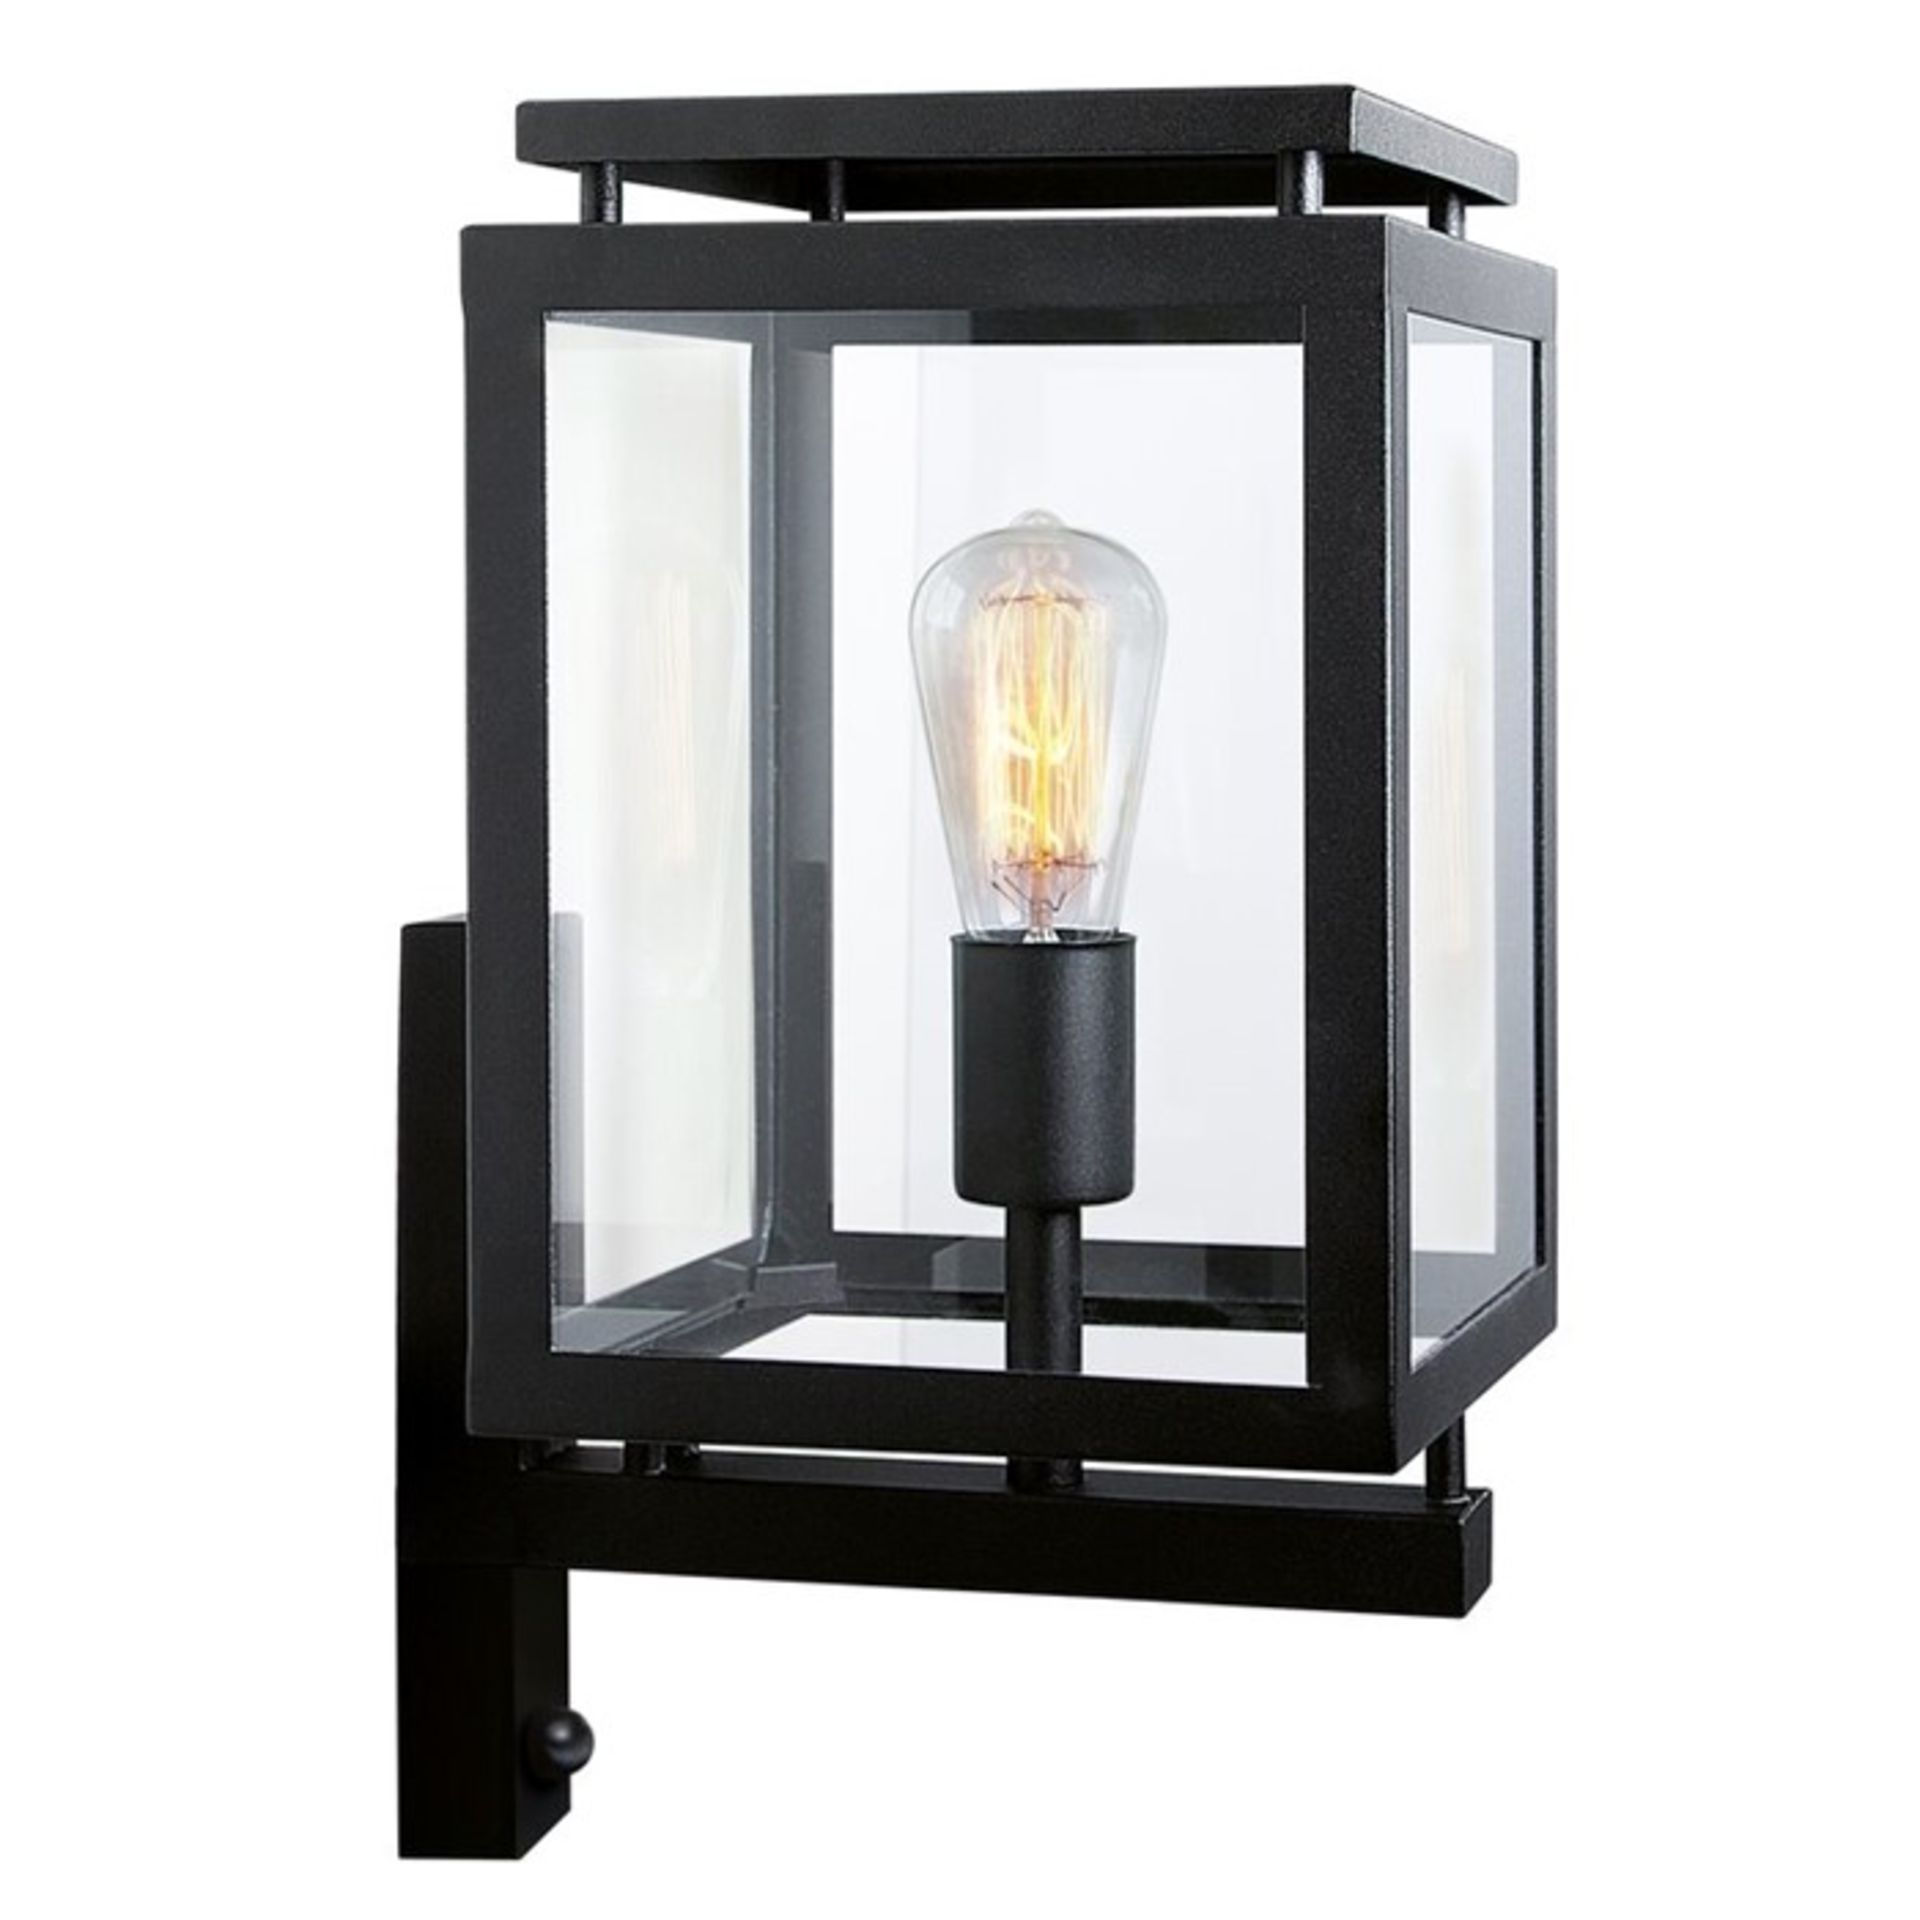 dCor design, De Vecht Outdoor Wall Lantern with PIR Sensor - RRP £196.99 (DCOO3989 - 13943/27) 7G